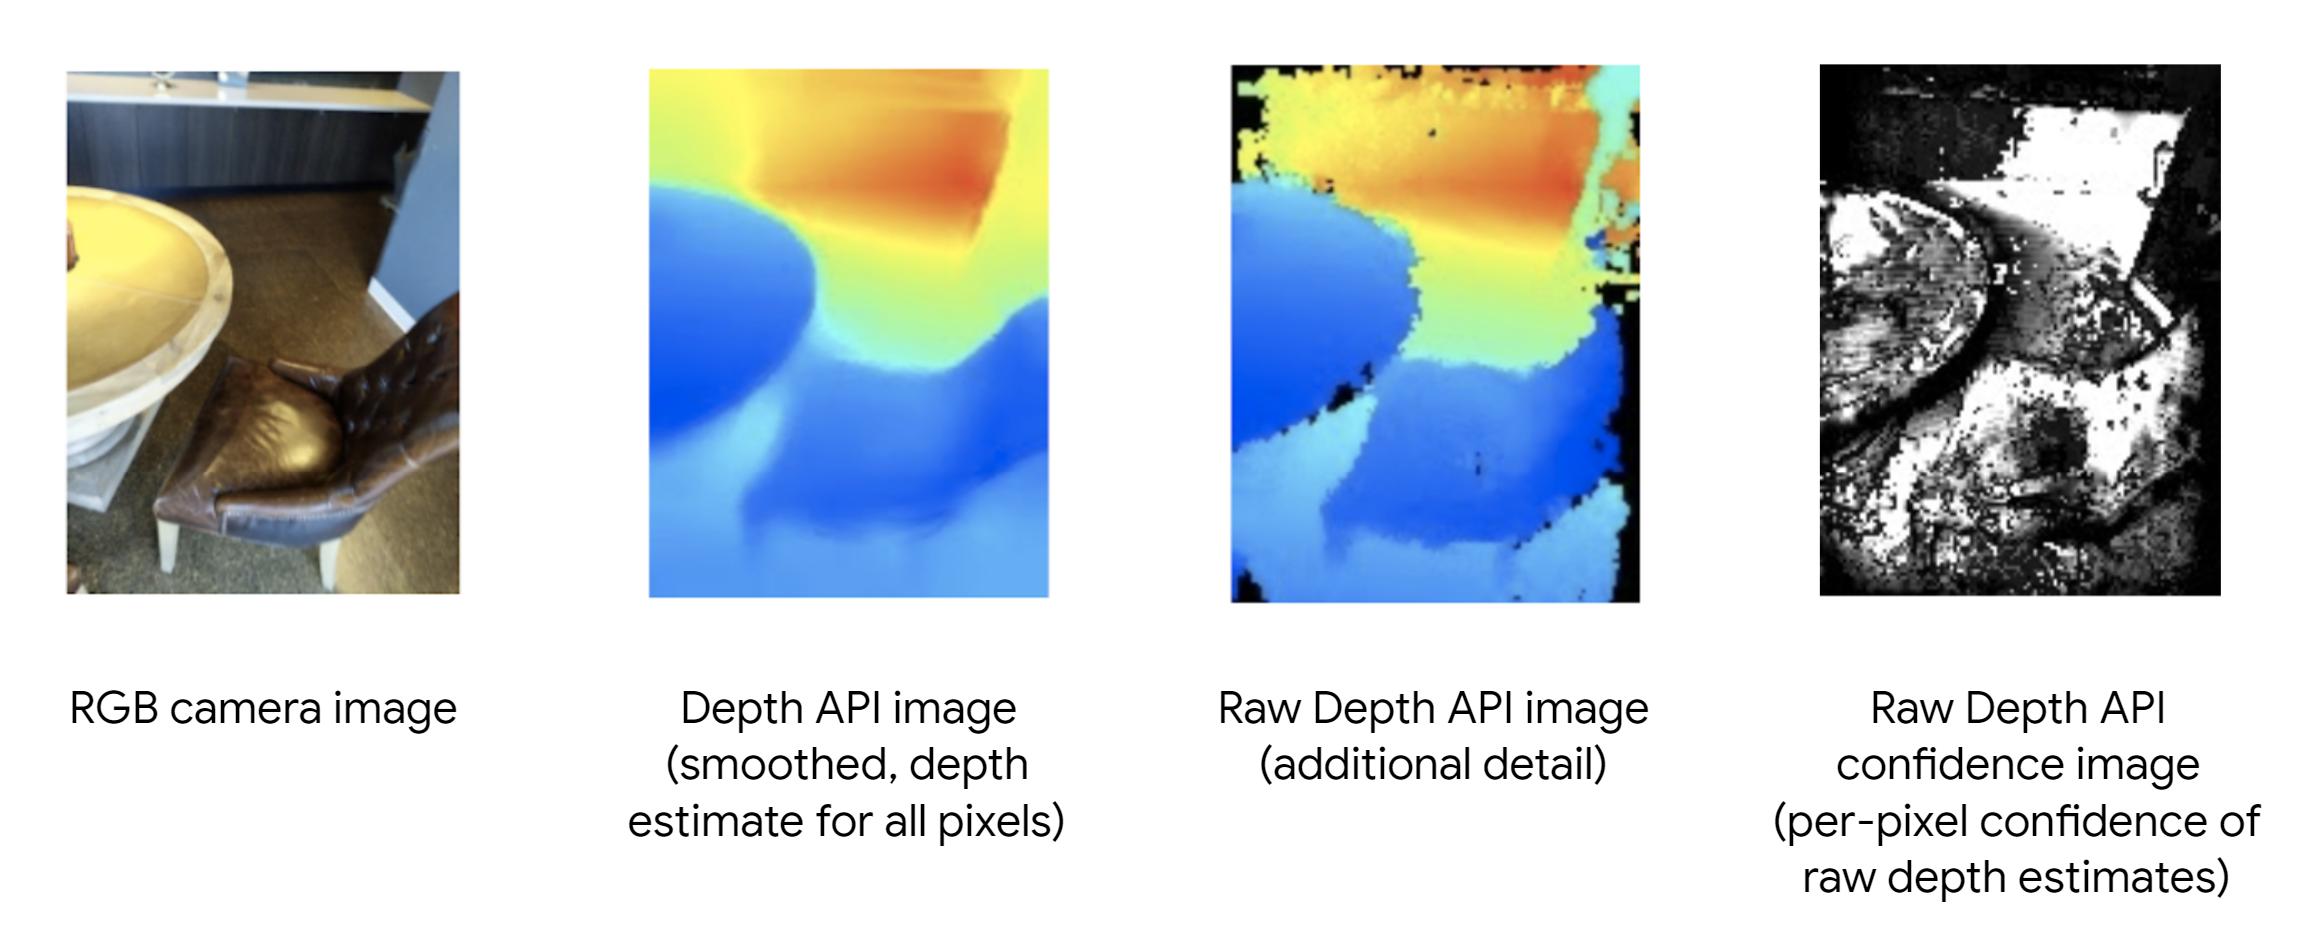 4 examples of ARCore Raw Depth API